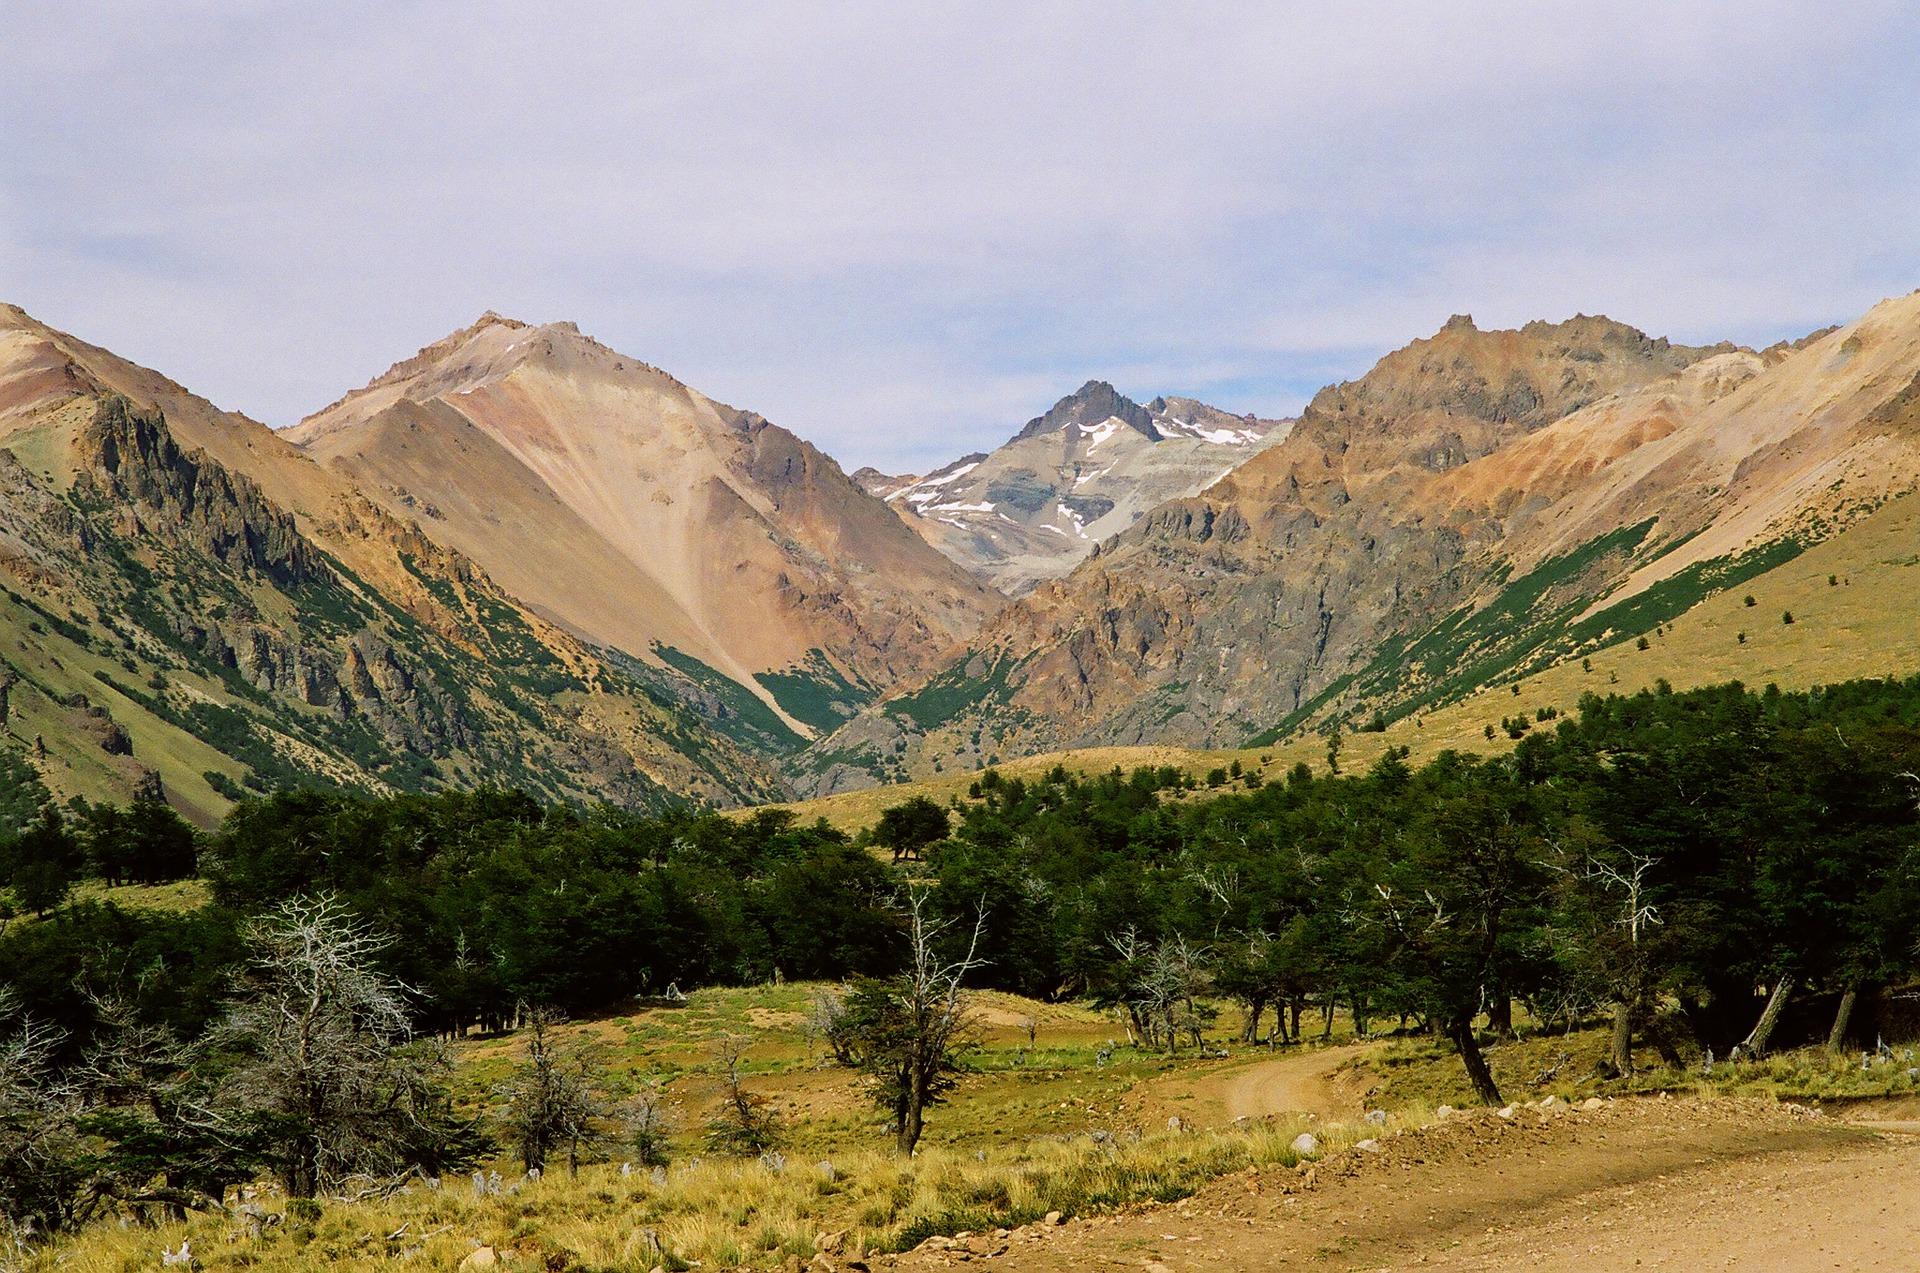 patagonia-970084_1920.jpg